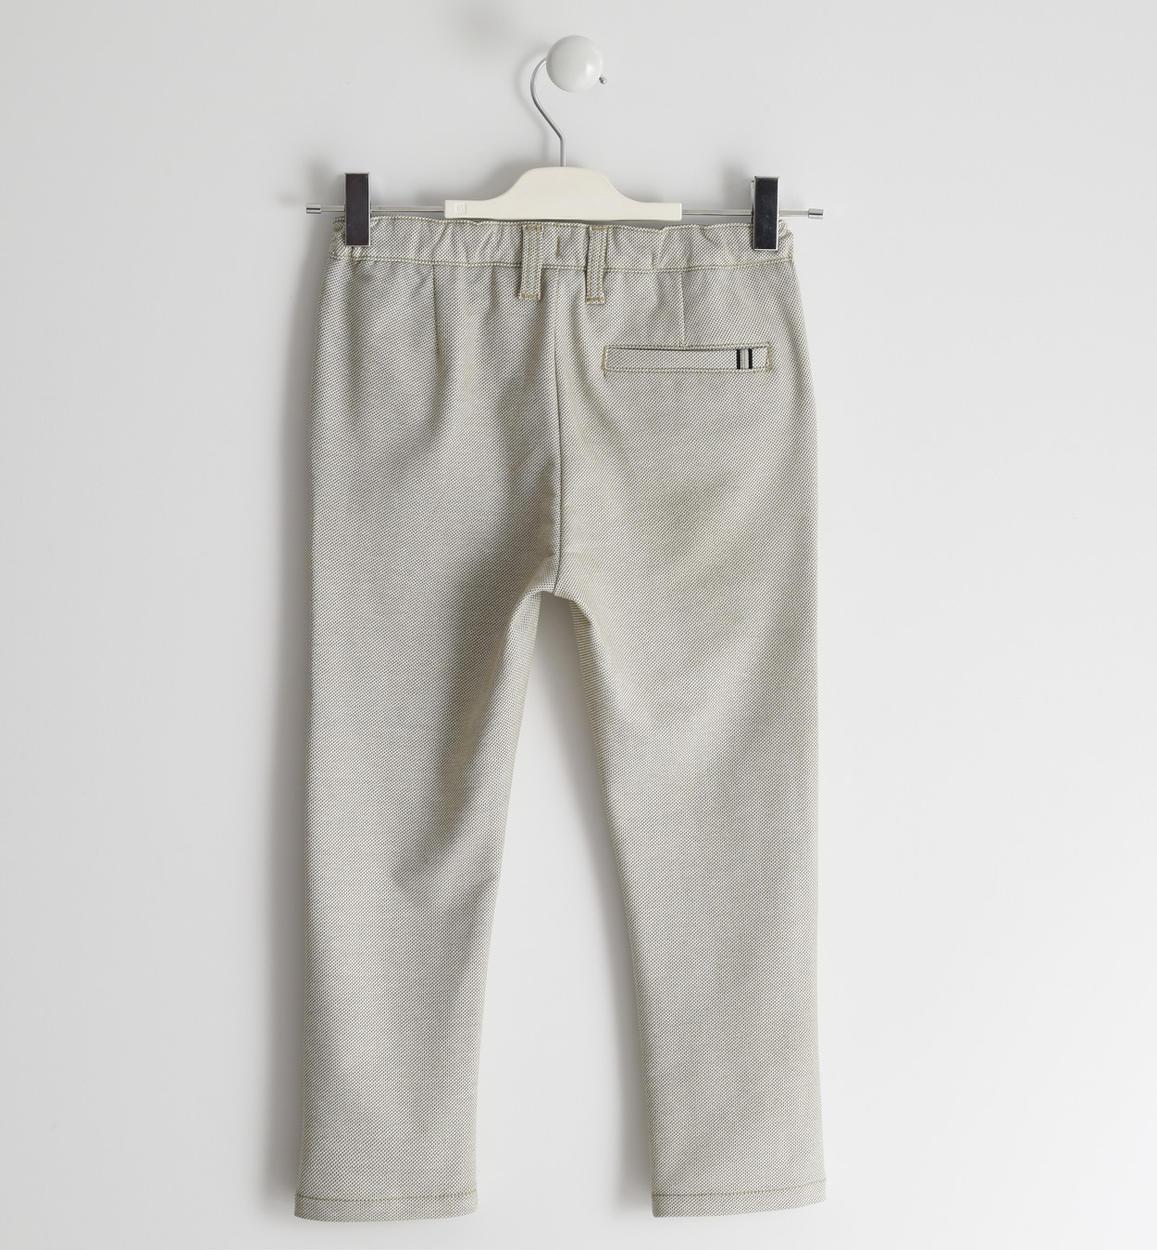 pantalone in felpina fantasia micro pois panna dettaglio 03 2524j42300 6mc7 150x150